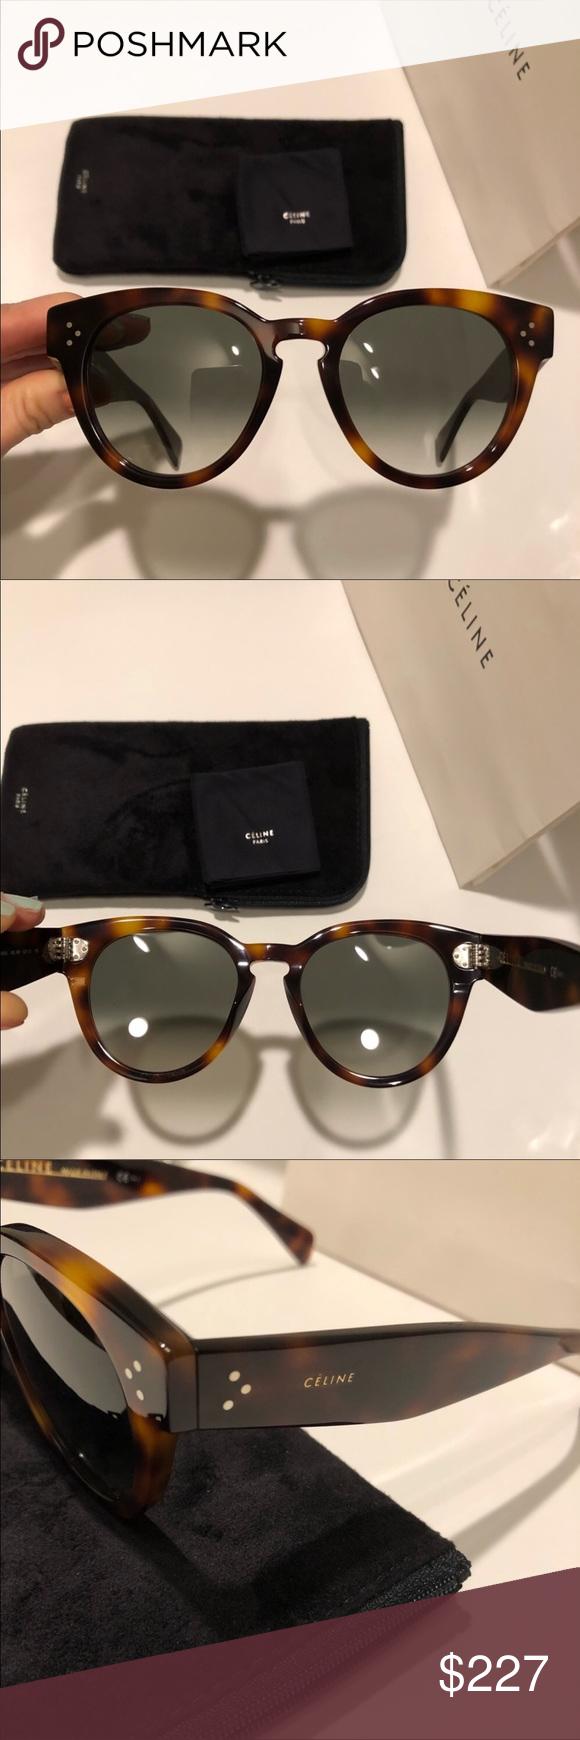 4ddbe74b489 Spotted while shopping on Poshmark  Celine sunglasses 👓!  poshmark   fashion  shopping  style  Celine  Accessories